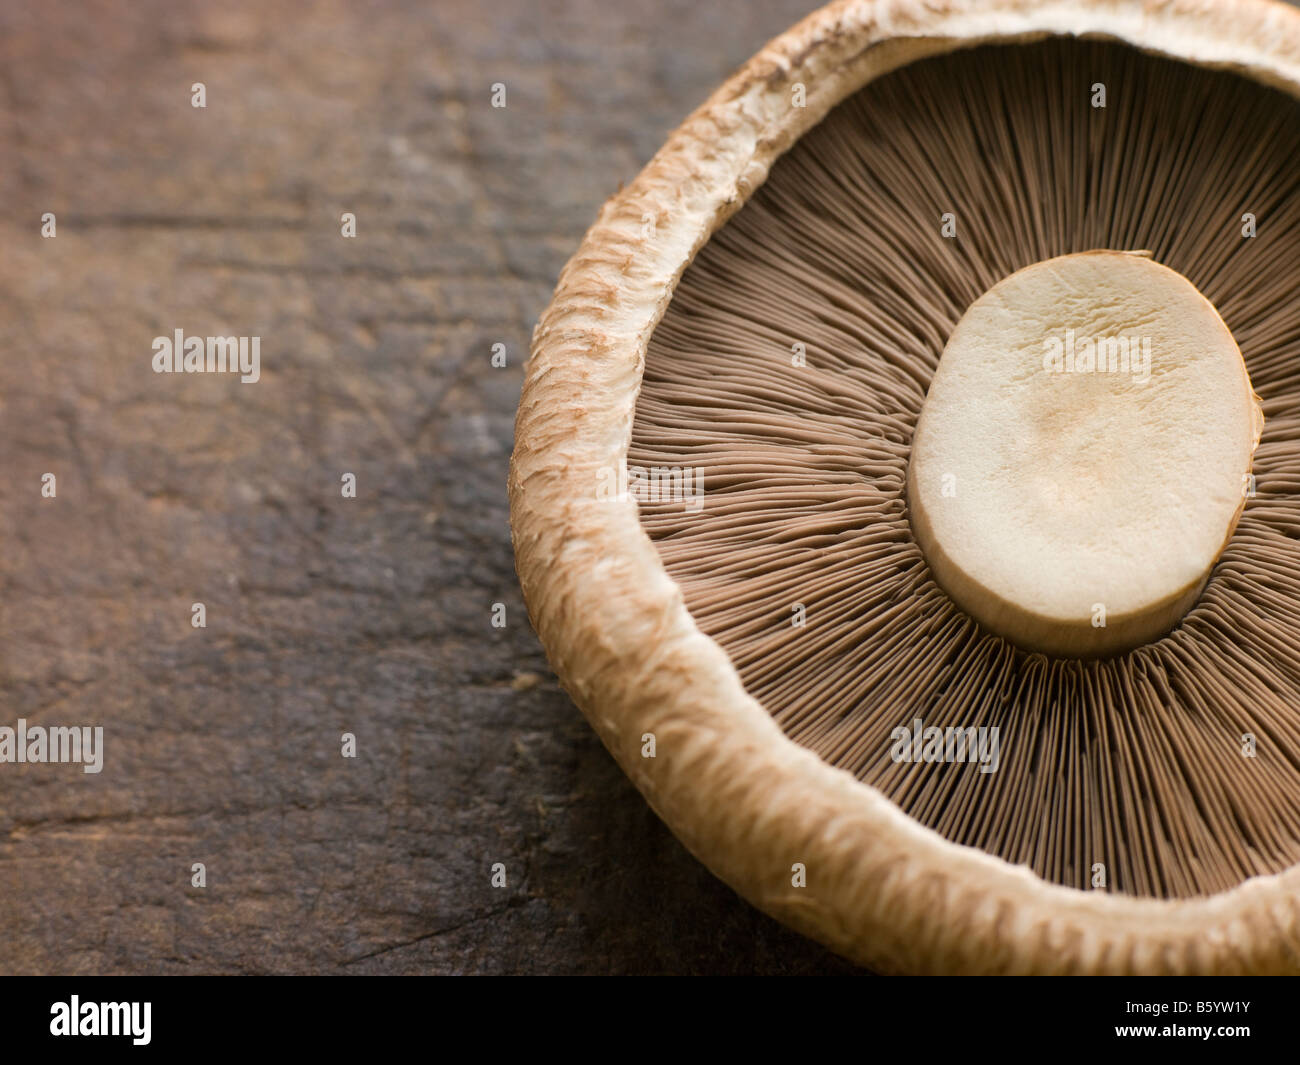 Portobello Mushroom - Stock Image